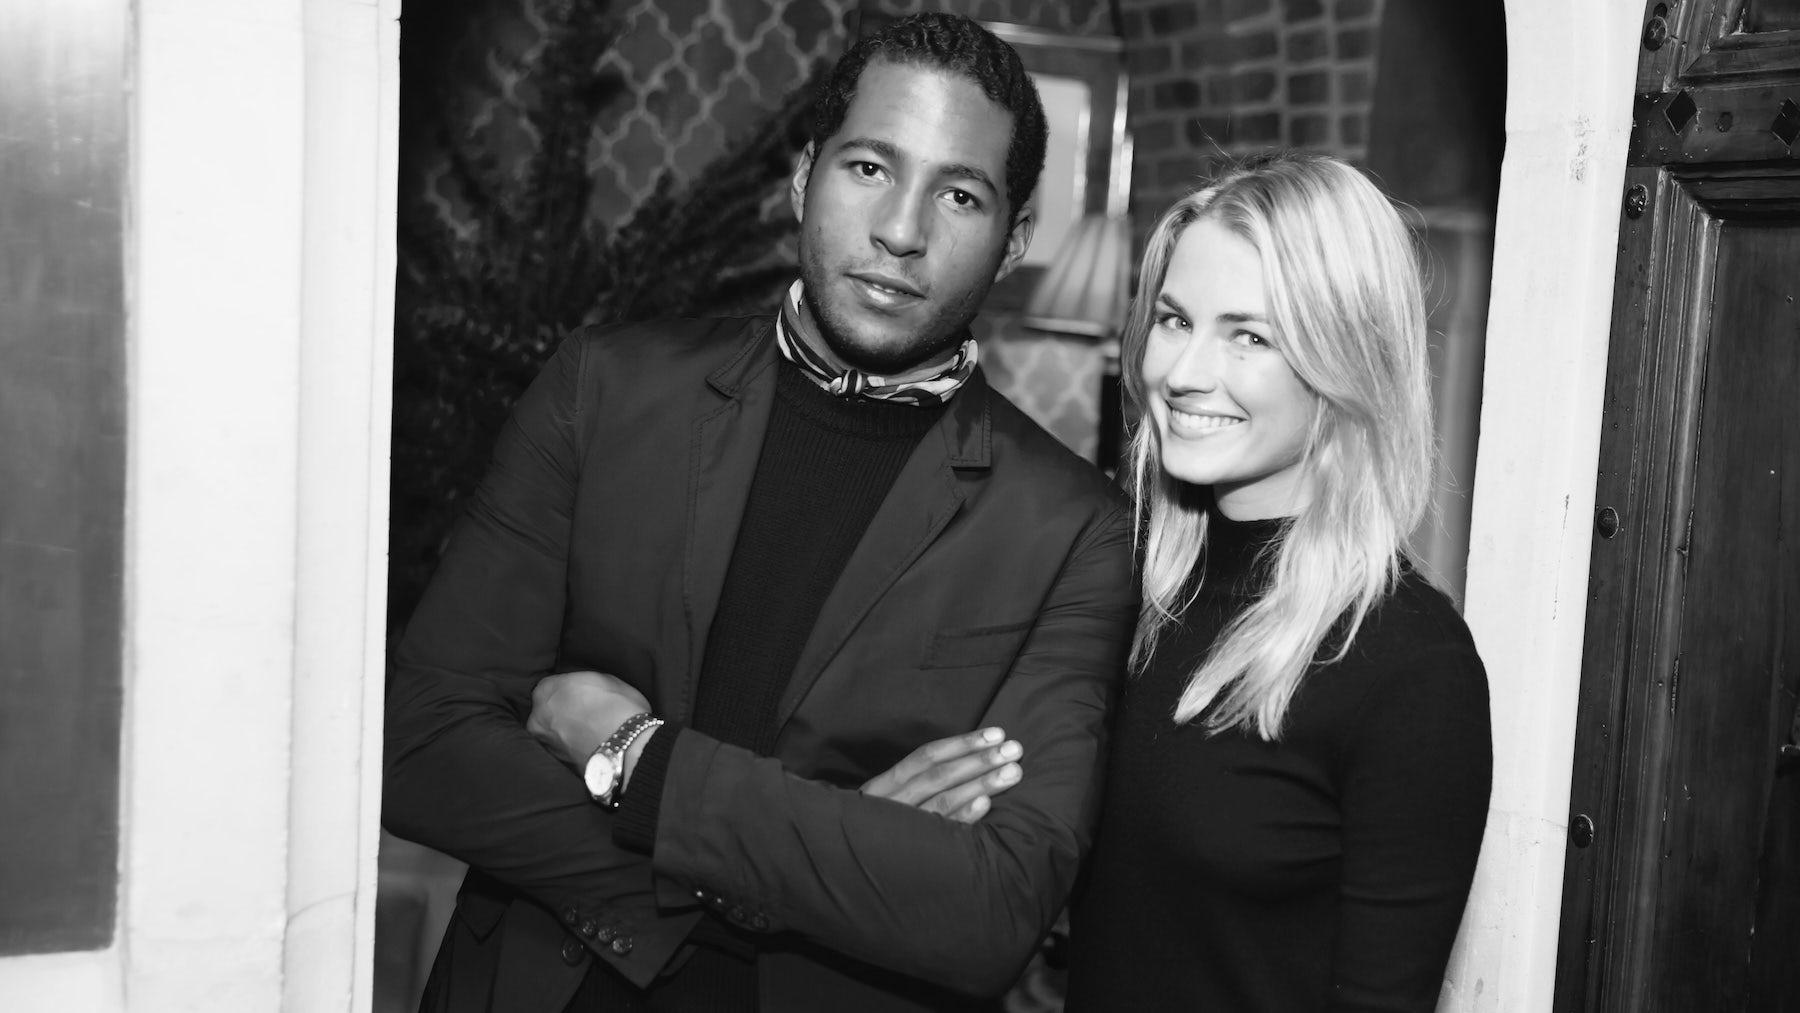 Hassan Pierre and Amanda Hearst, co-founders of Maison-de-mode.com | Source: Courtesy